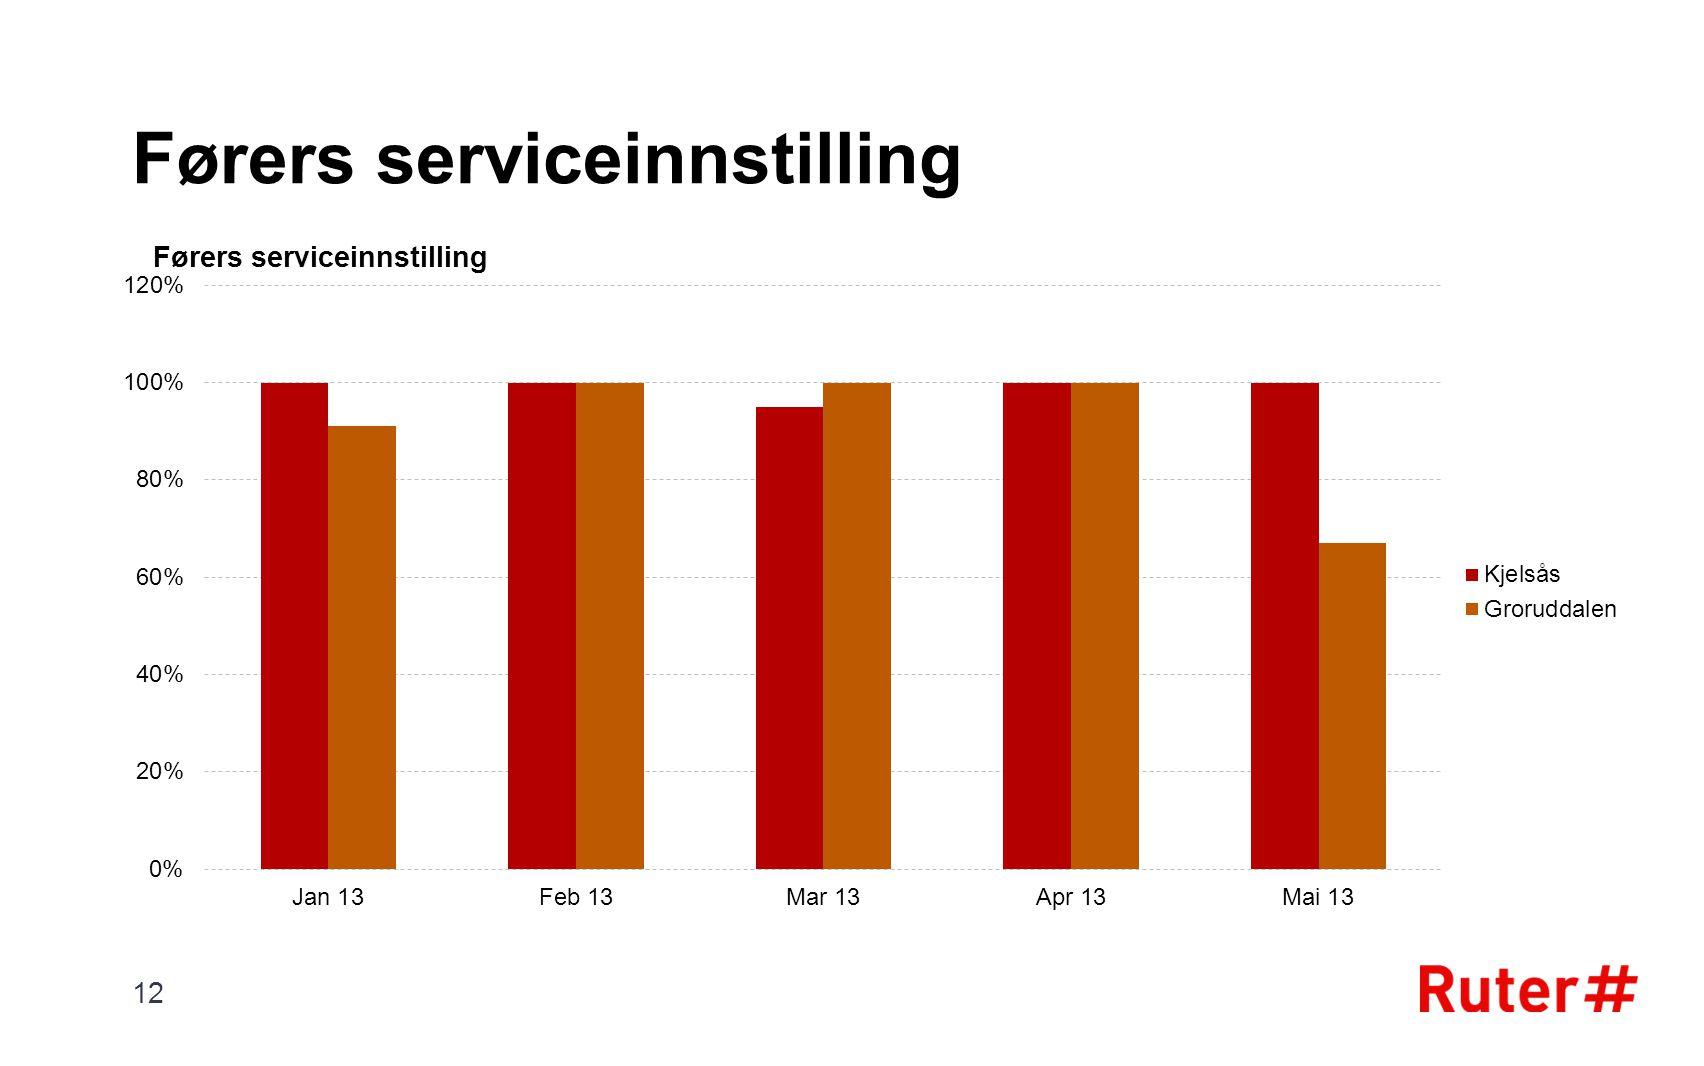 Førers serviceinnstilling